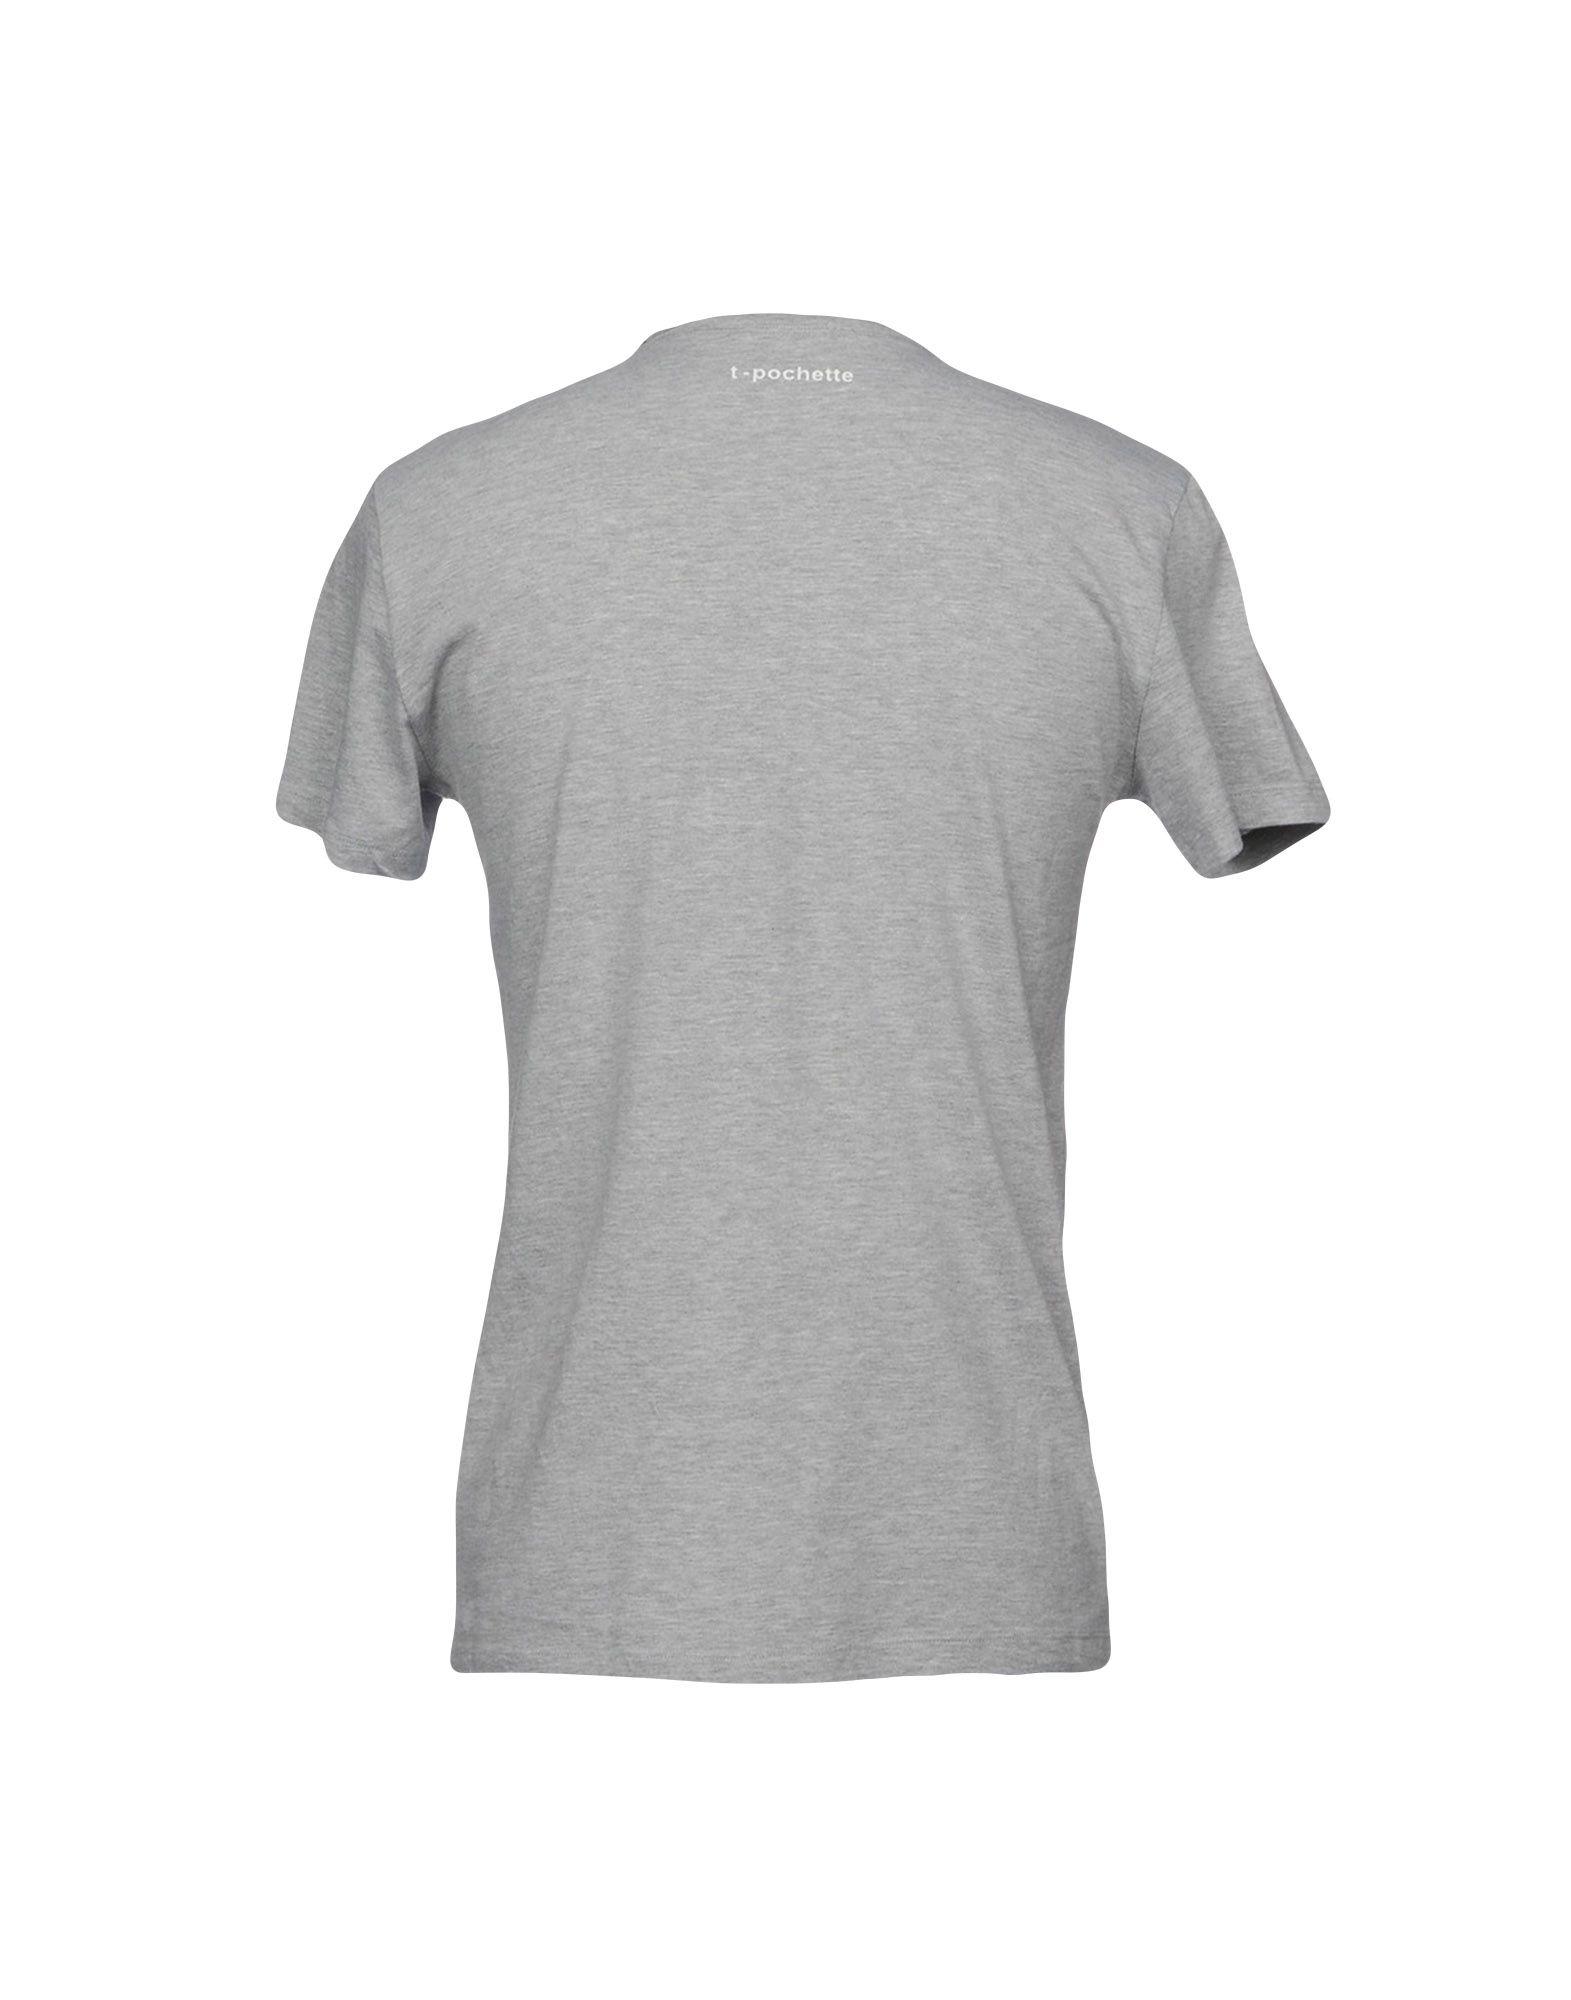 A buon mercato A buon buon buon mercato T-Shirt Roda Uomo - 12082646EF bbb864